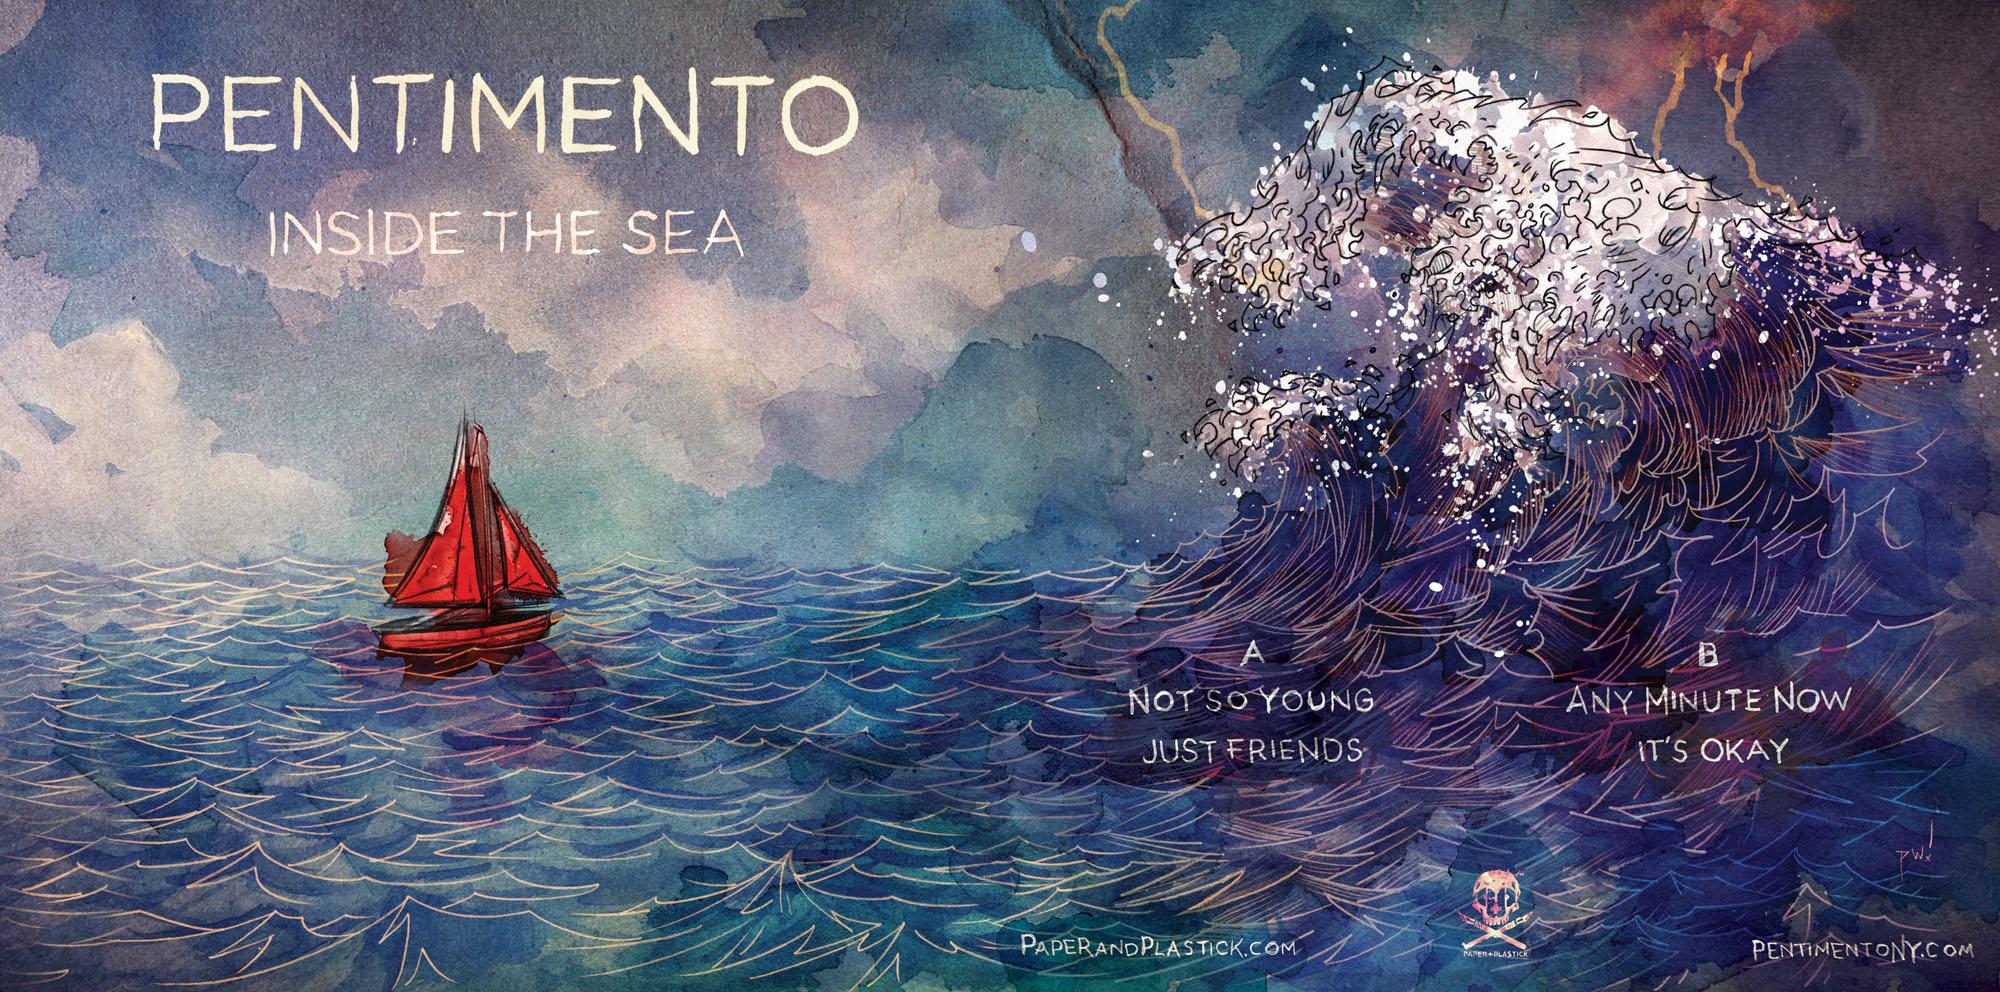 Pentimento - Inside The Sea